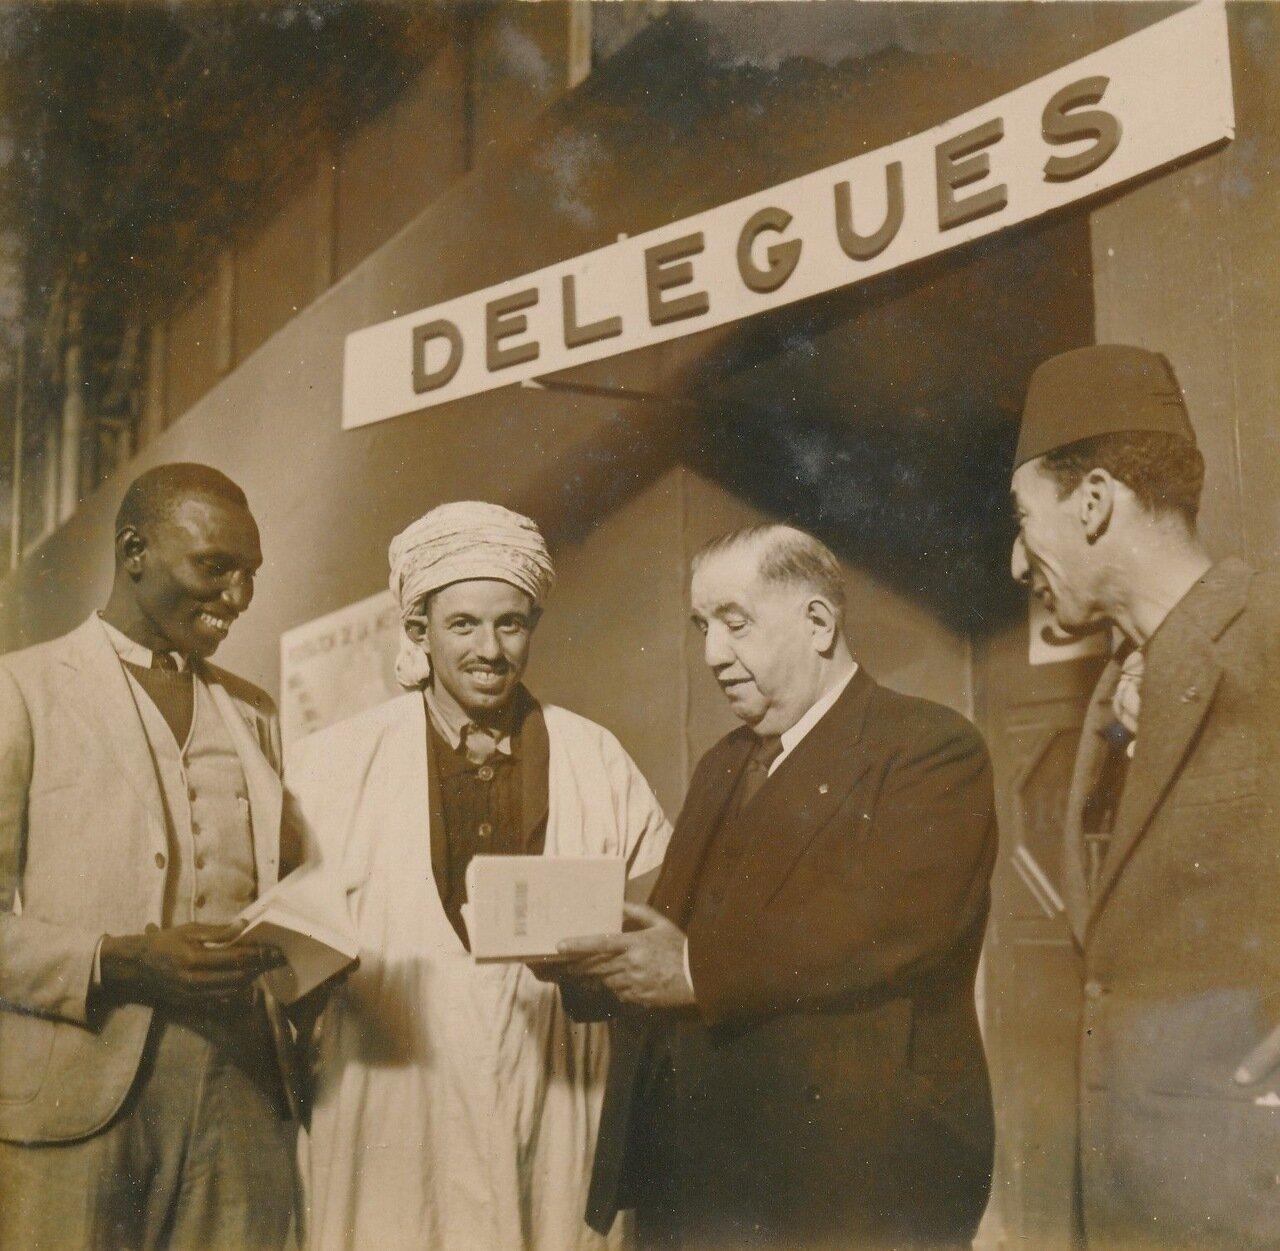 1936. Делегаты Орана и Алжира